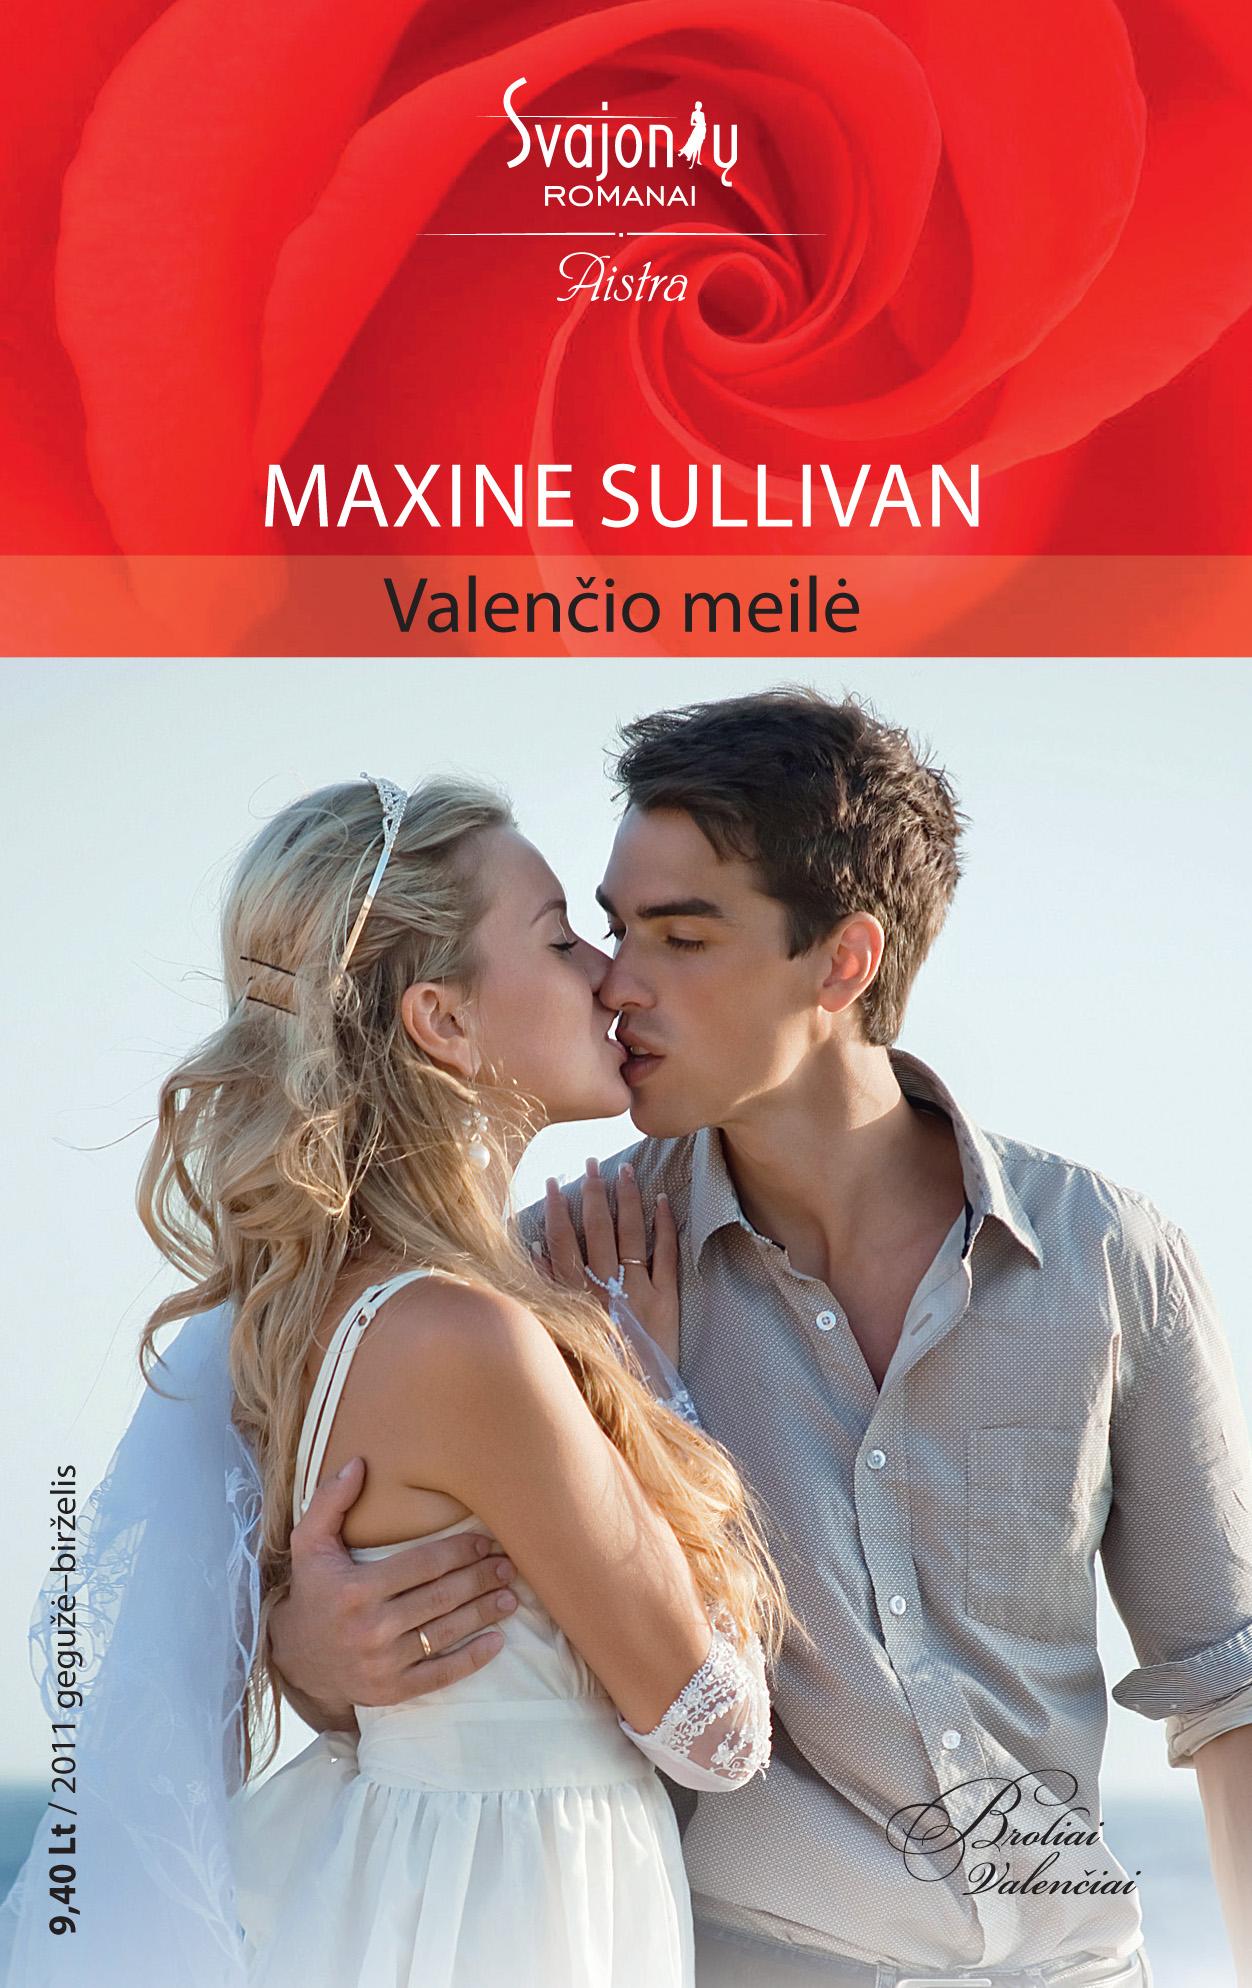 цены Maxine Sullivan Valenčio meilė